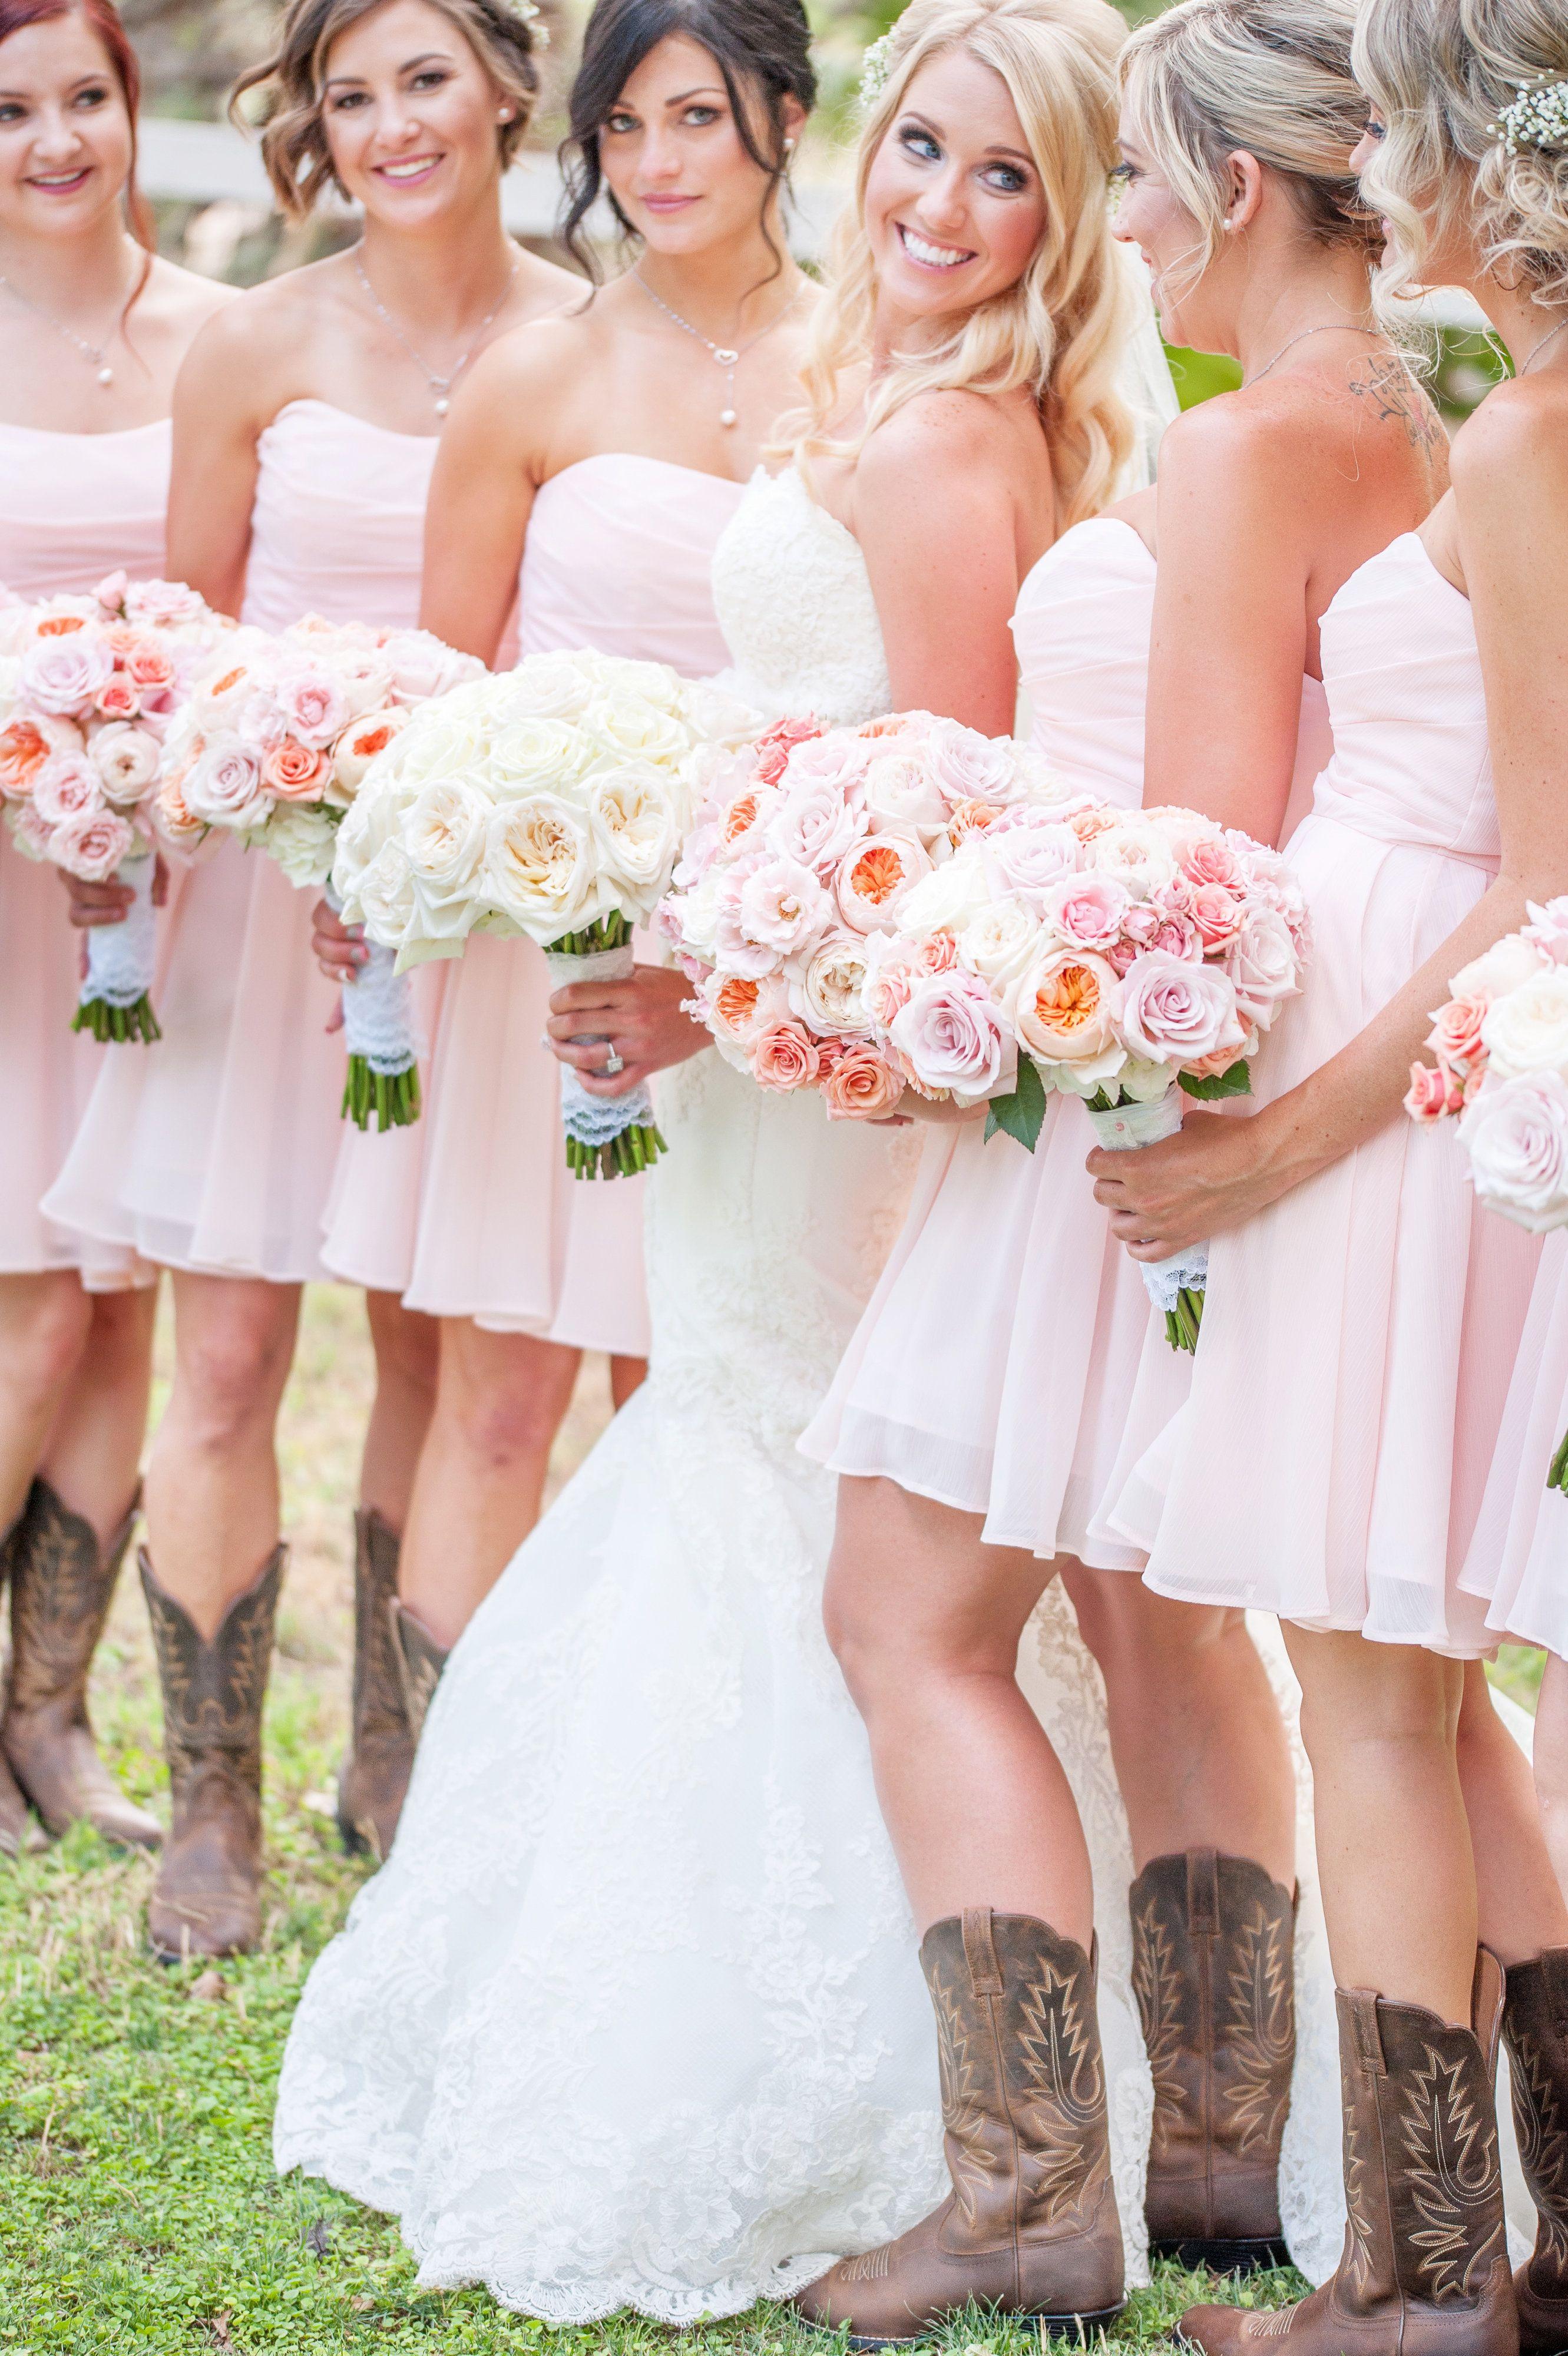 Pink Glam Rustic Chic Wedding Bride Rustic Chic Wedding Country Wedding Dresses